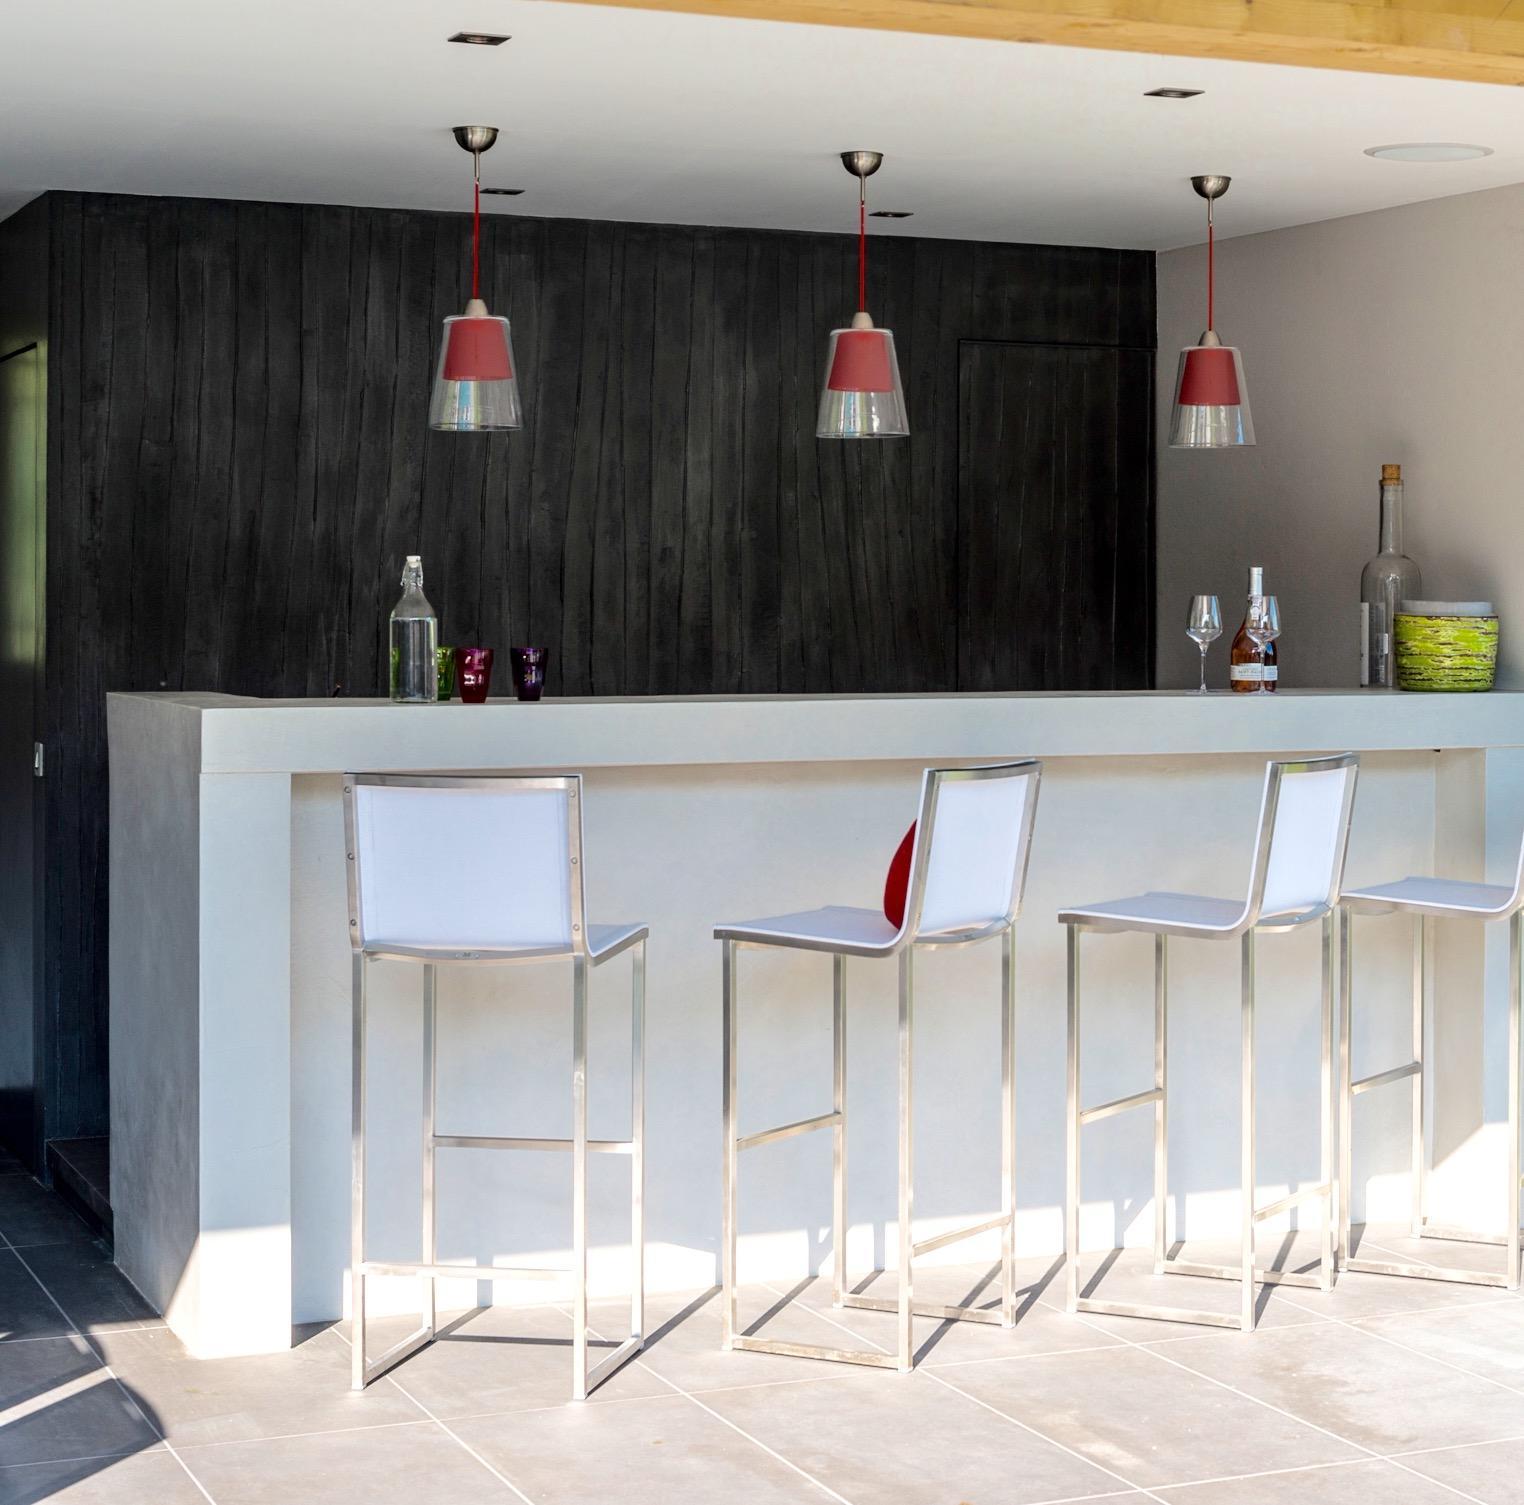 ordinary bar en beton cire 14 atelier design beton cire commerce bar nantes homeezy. Black Bedroom Furniture Sets. Home Design Ideas